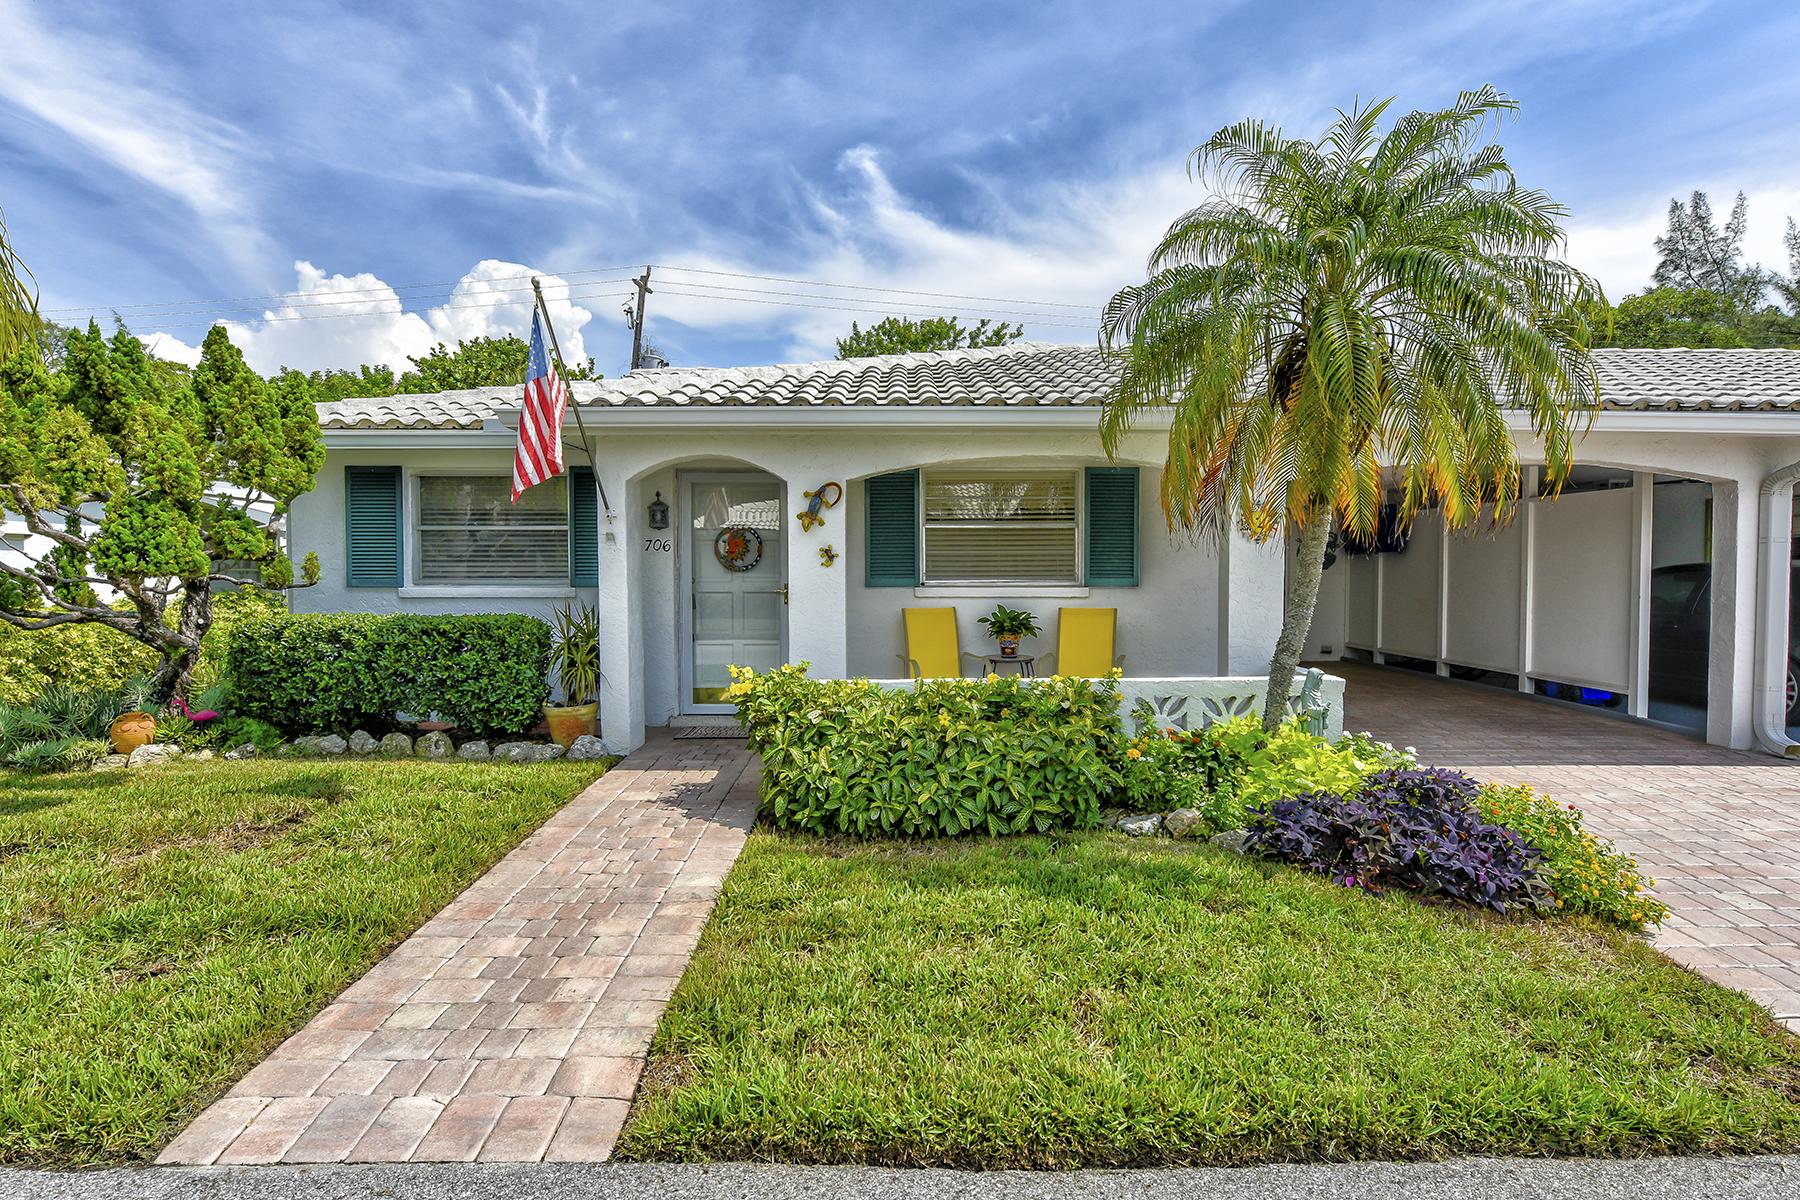 联栋屋 为 销售 在 SPANISH MAIN YACHT CLUB 706 Spanish Dr S Longboat Key, 佛罗里达州 34228 美国